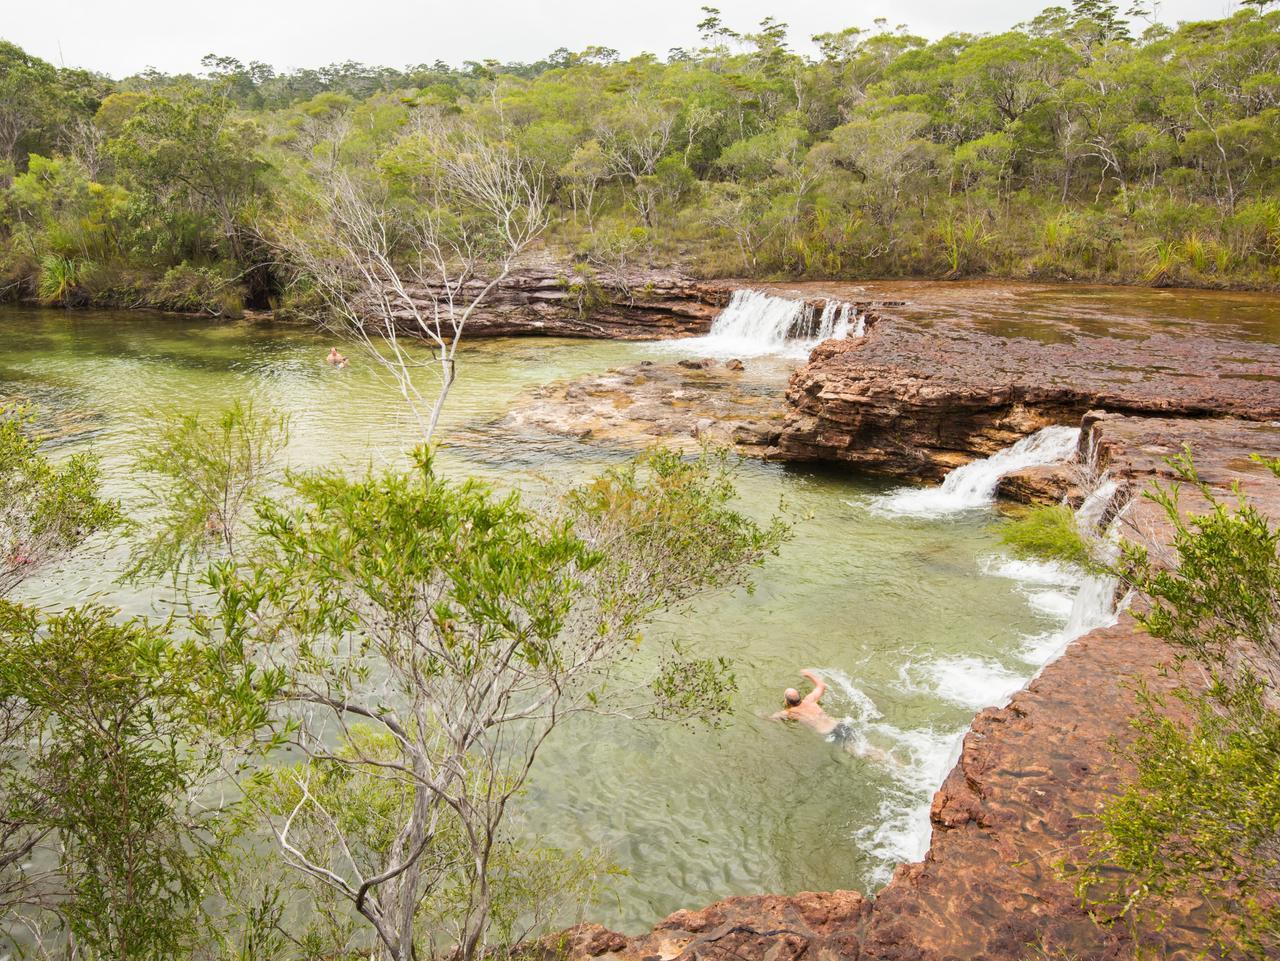 Fruit Bat Falls, Cape York. Picture: Tourism Tropical North Queensland/Andrew Tallon (must credit) Celeste Mitchell, Cape York 4WD, Sunday Escape